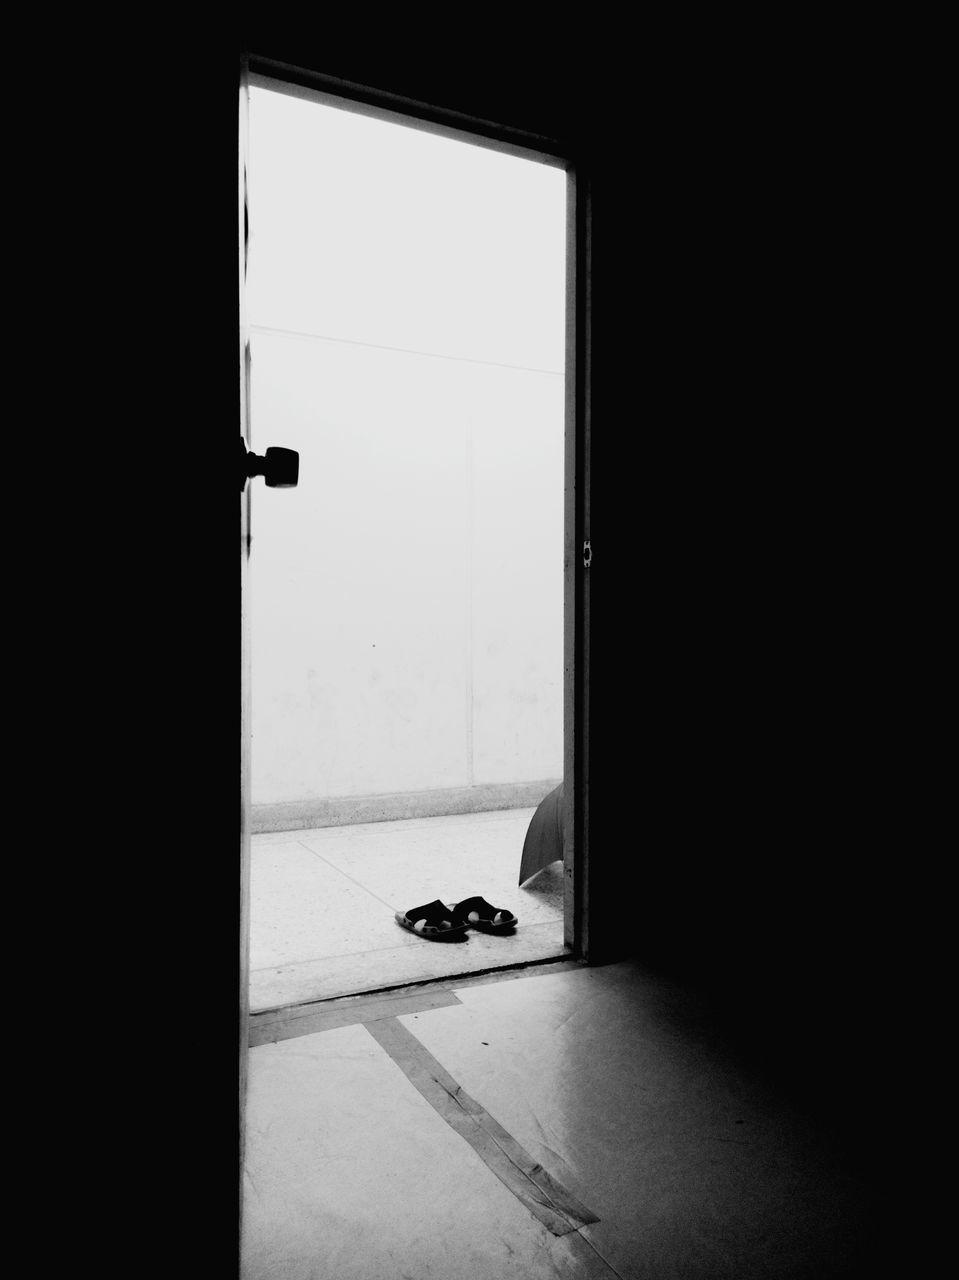 VIEW OF AN ANIMAL SEEN THROUGH OPEN WINDOW